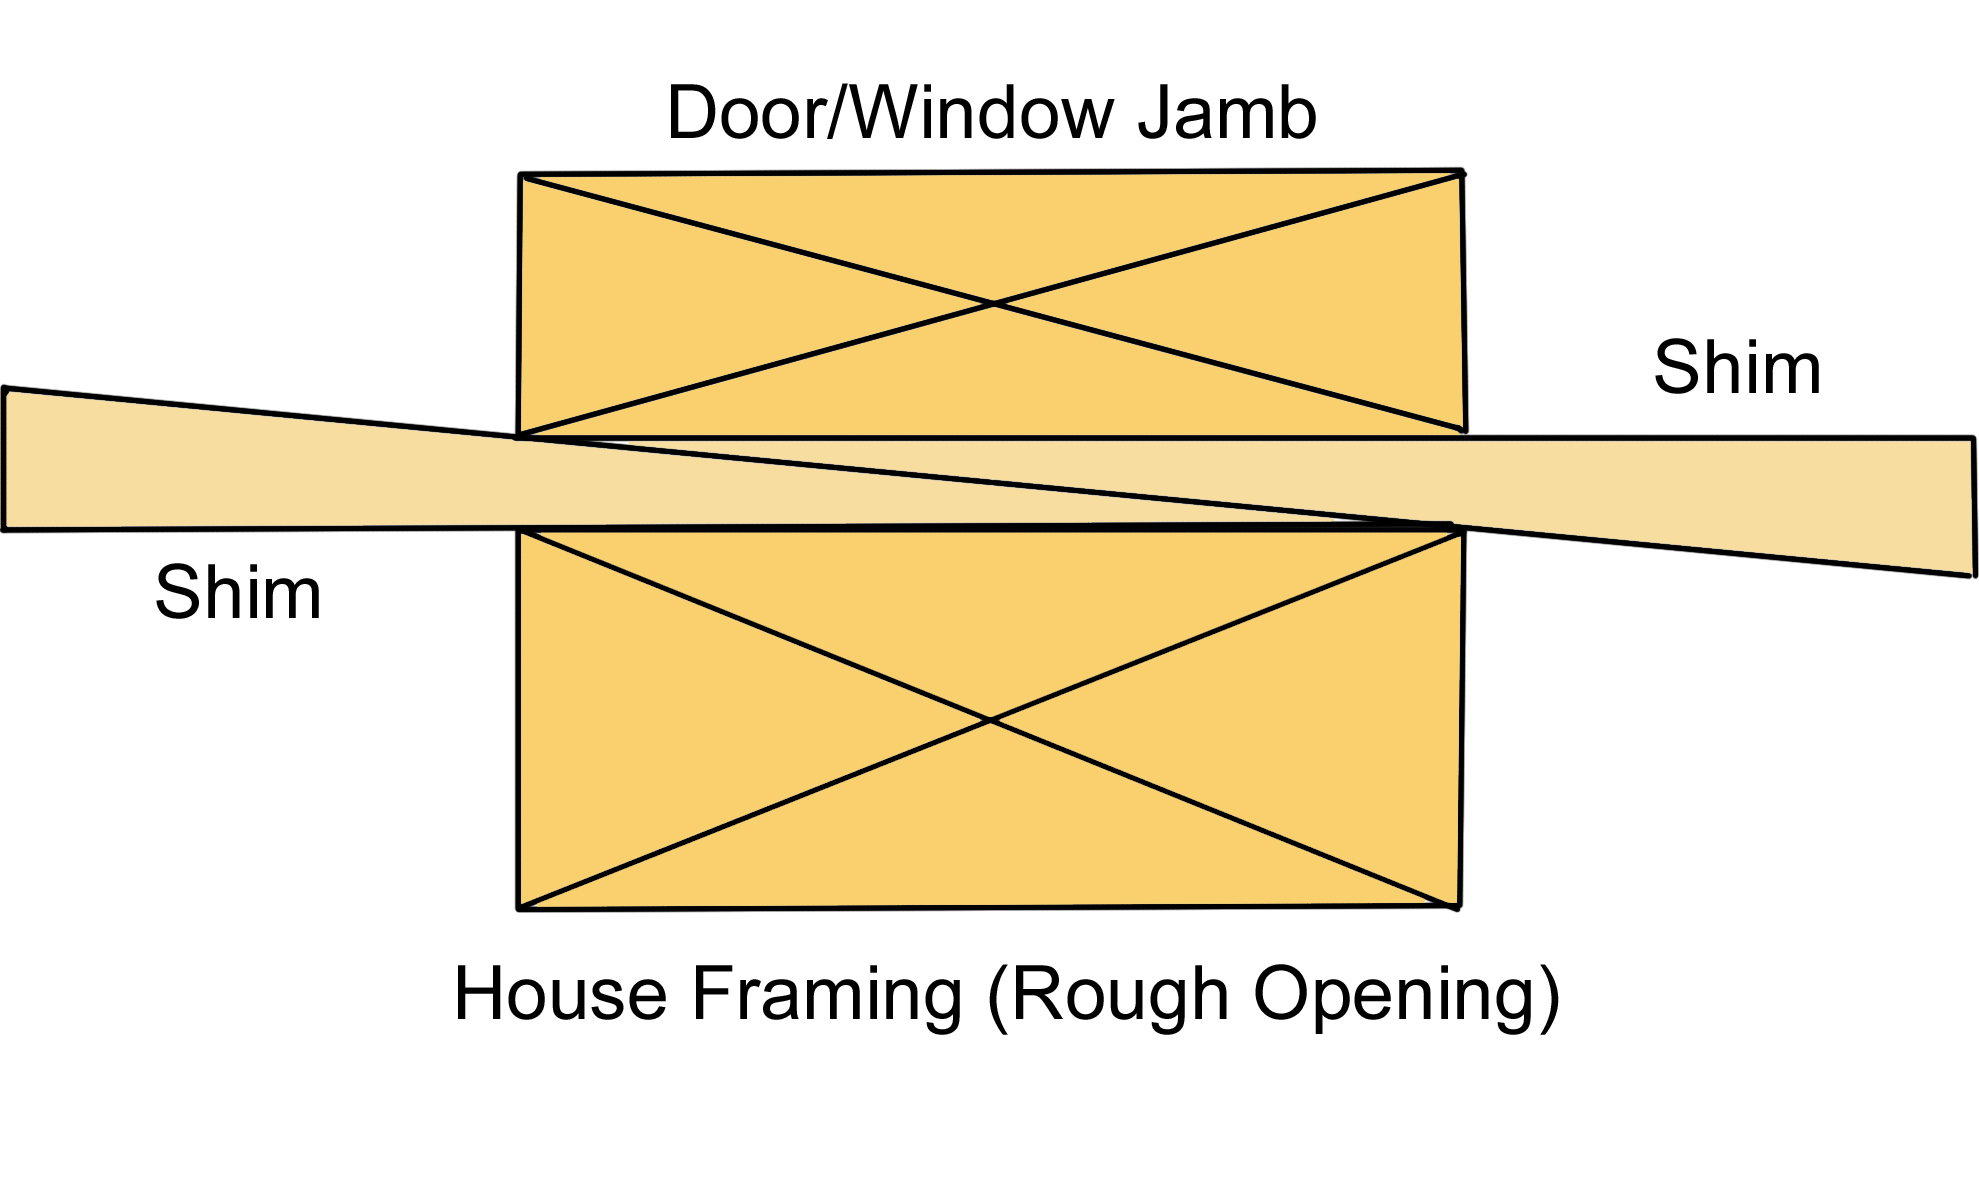 M Weber shim diagram  sc 1 st  Extreme How-To Blog & How to Use Wood Shims - Extreme How-To Blog